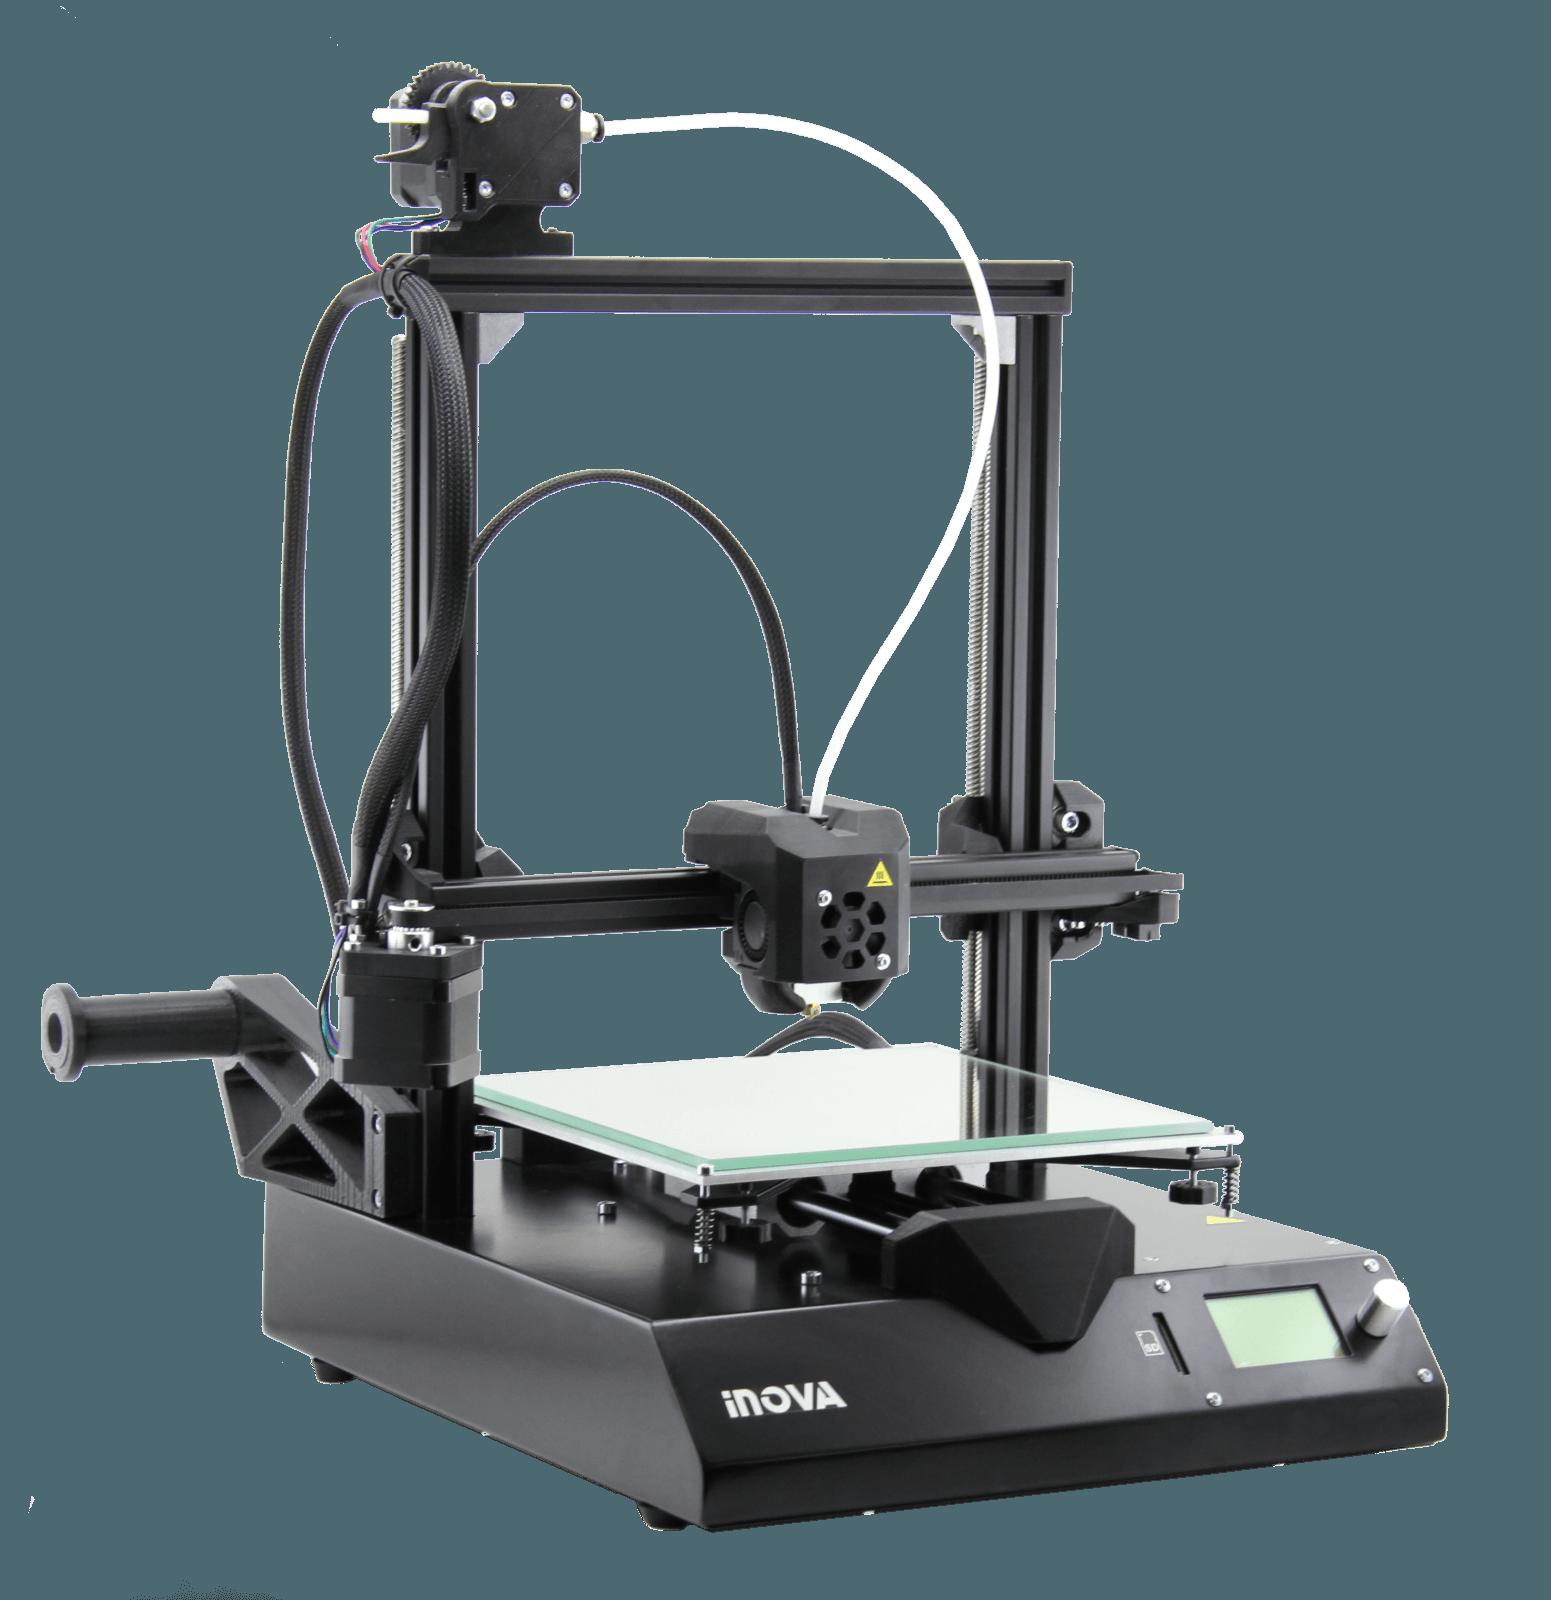 3-D принтер Inova С